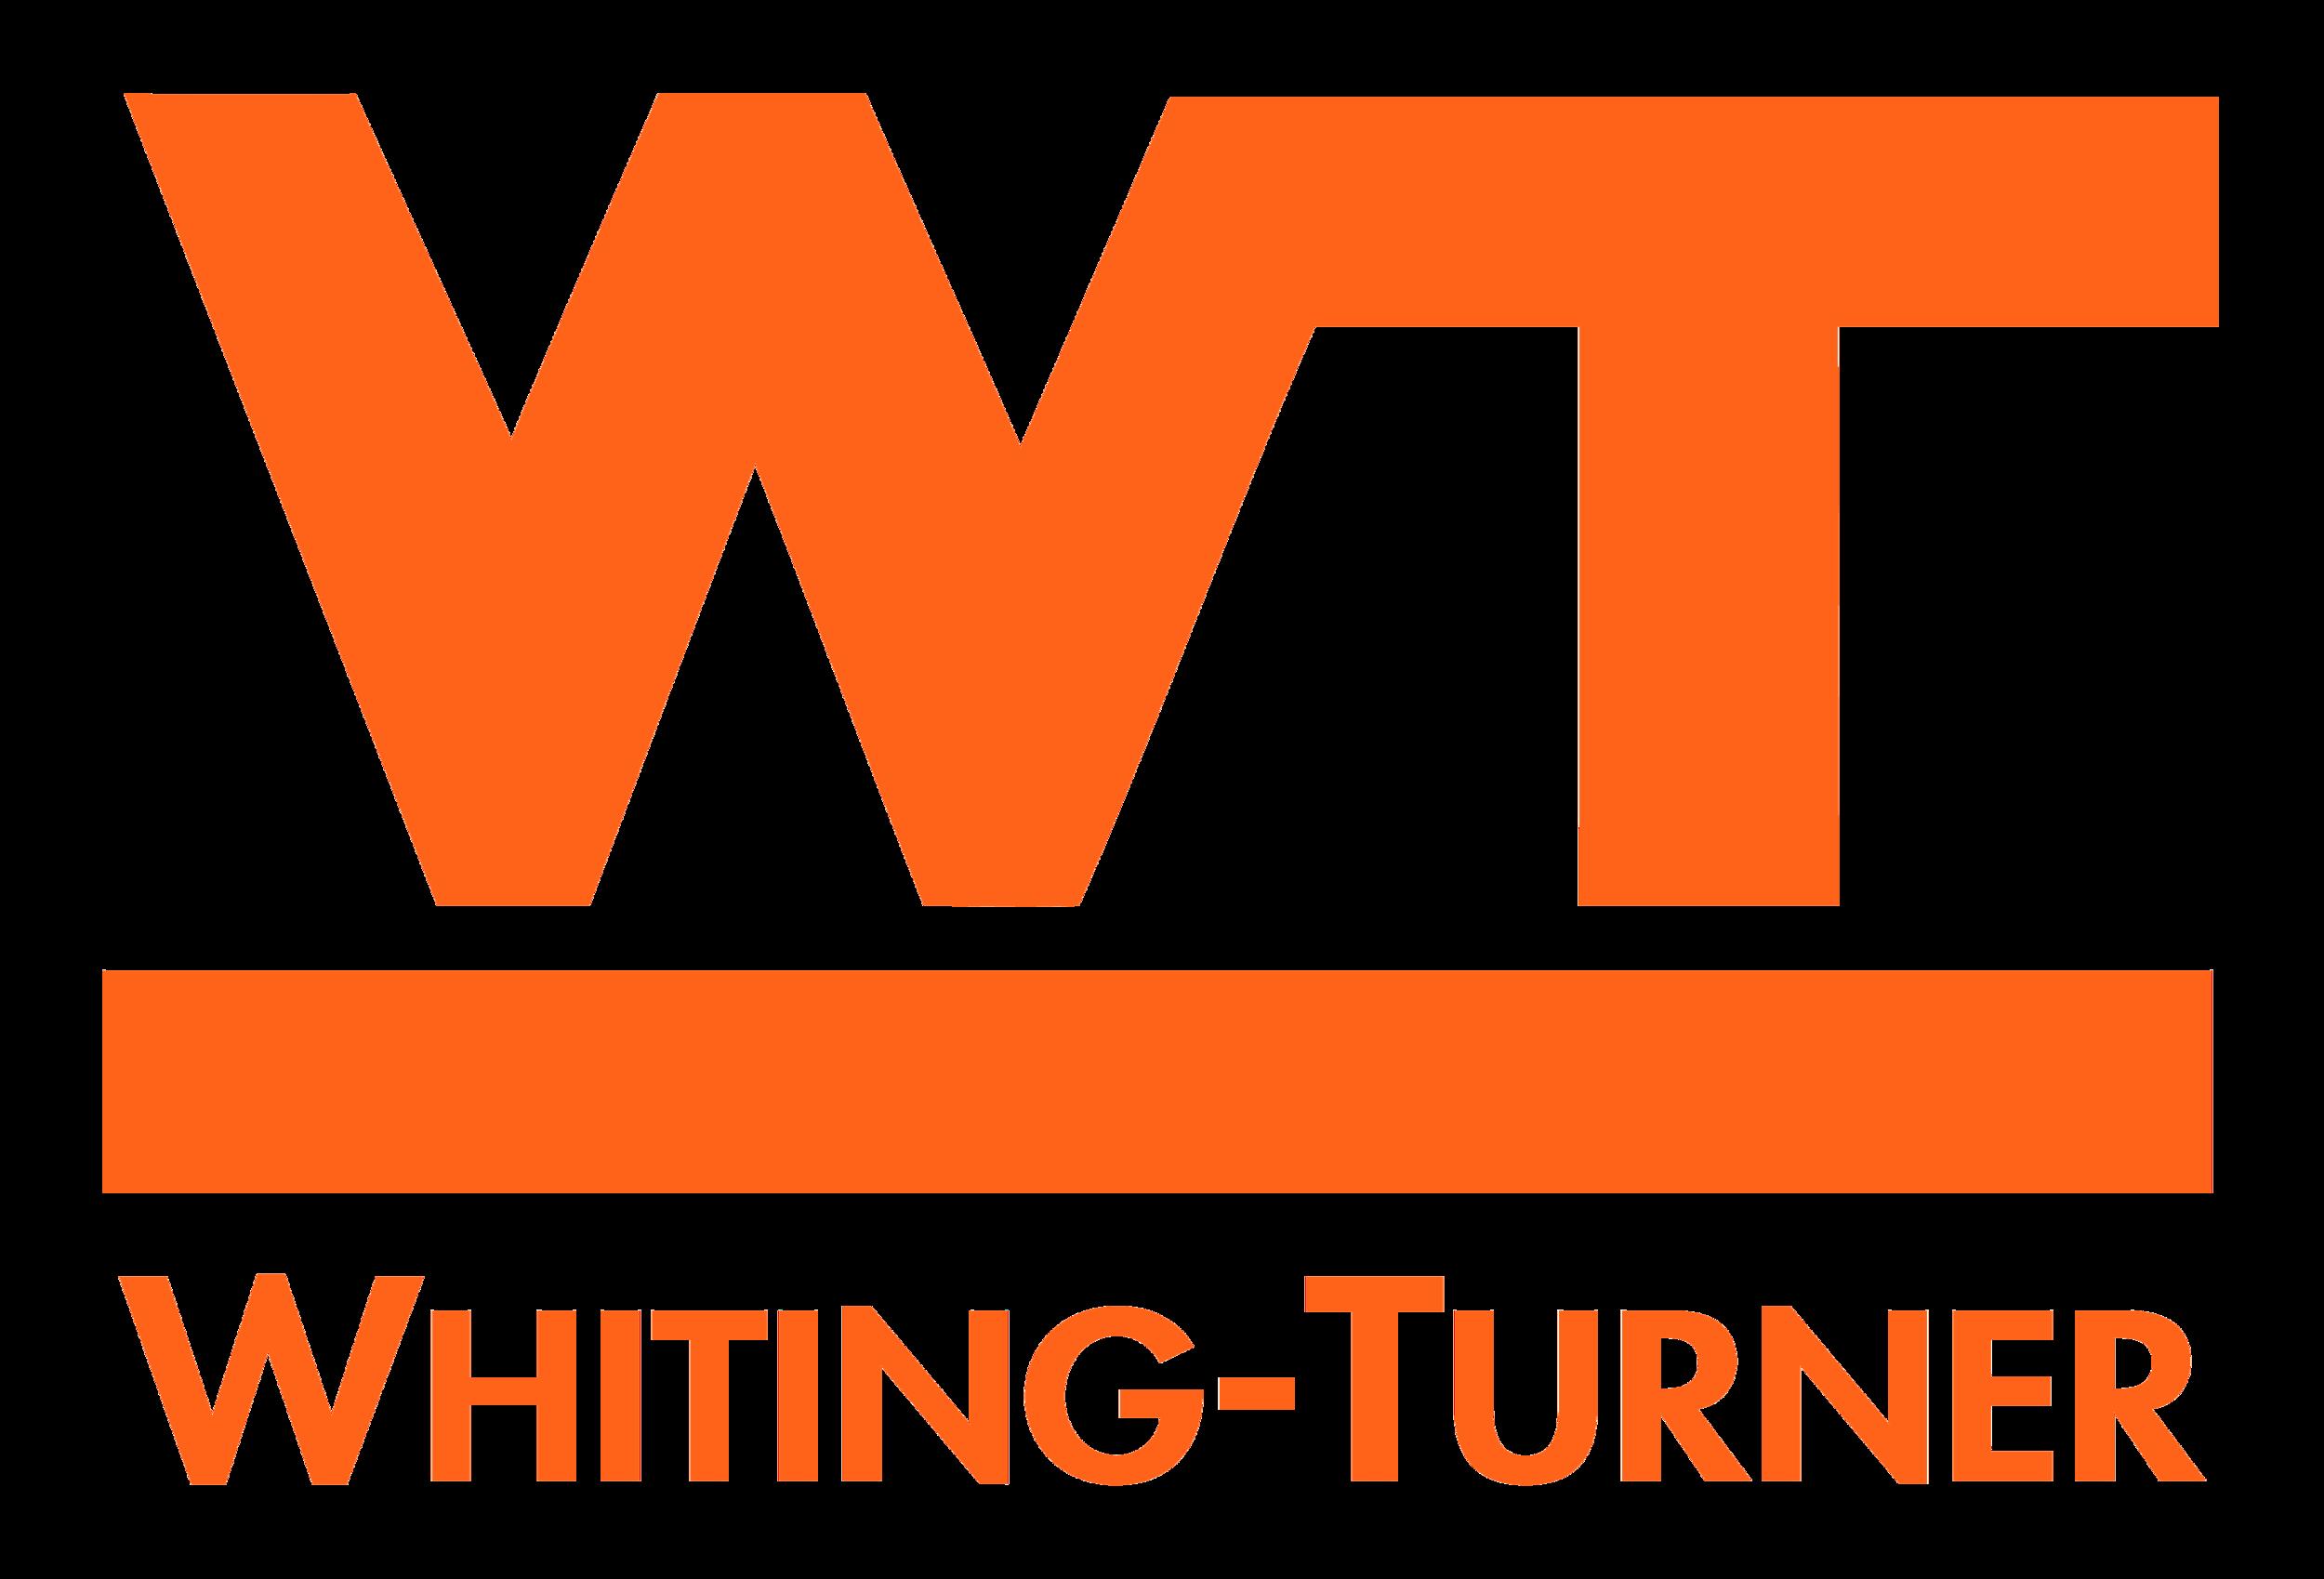 WT-Orange.png